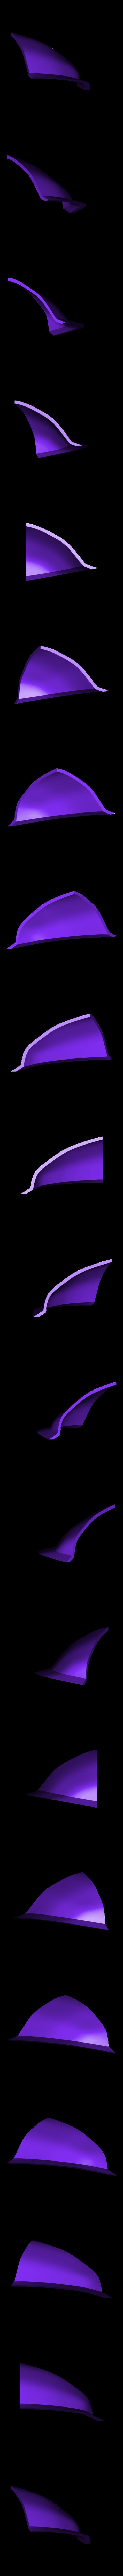 Part 13 v1.stl Download STL file ARF Trooper Helmet • 3D print object, VillainousPropShop